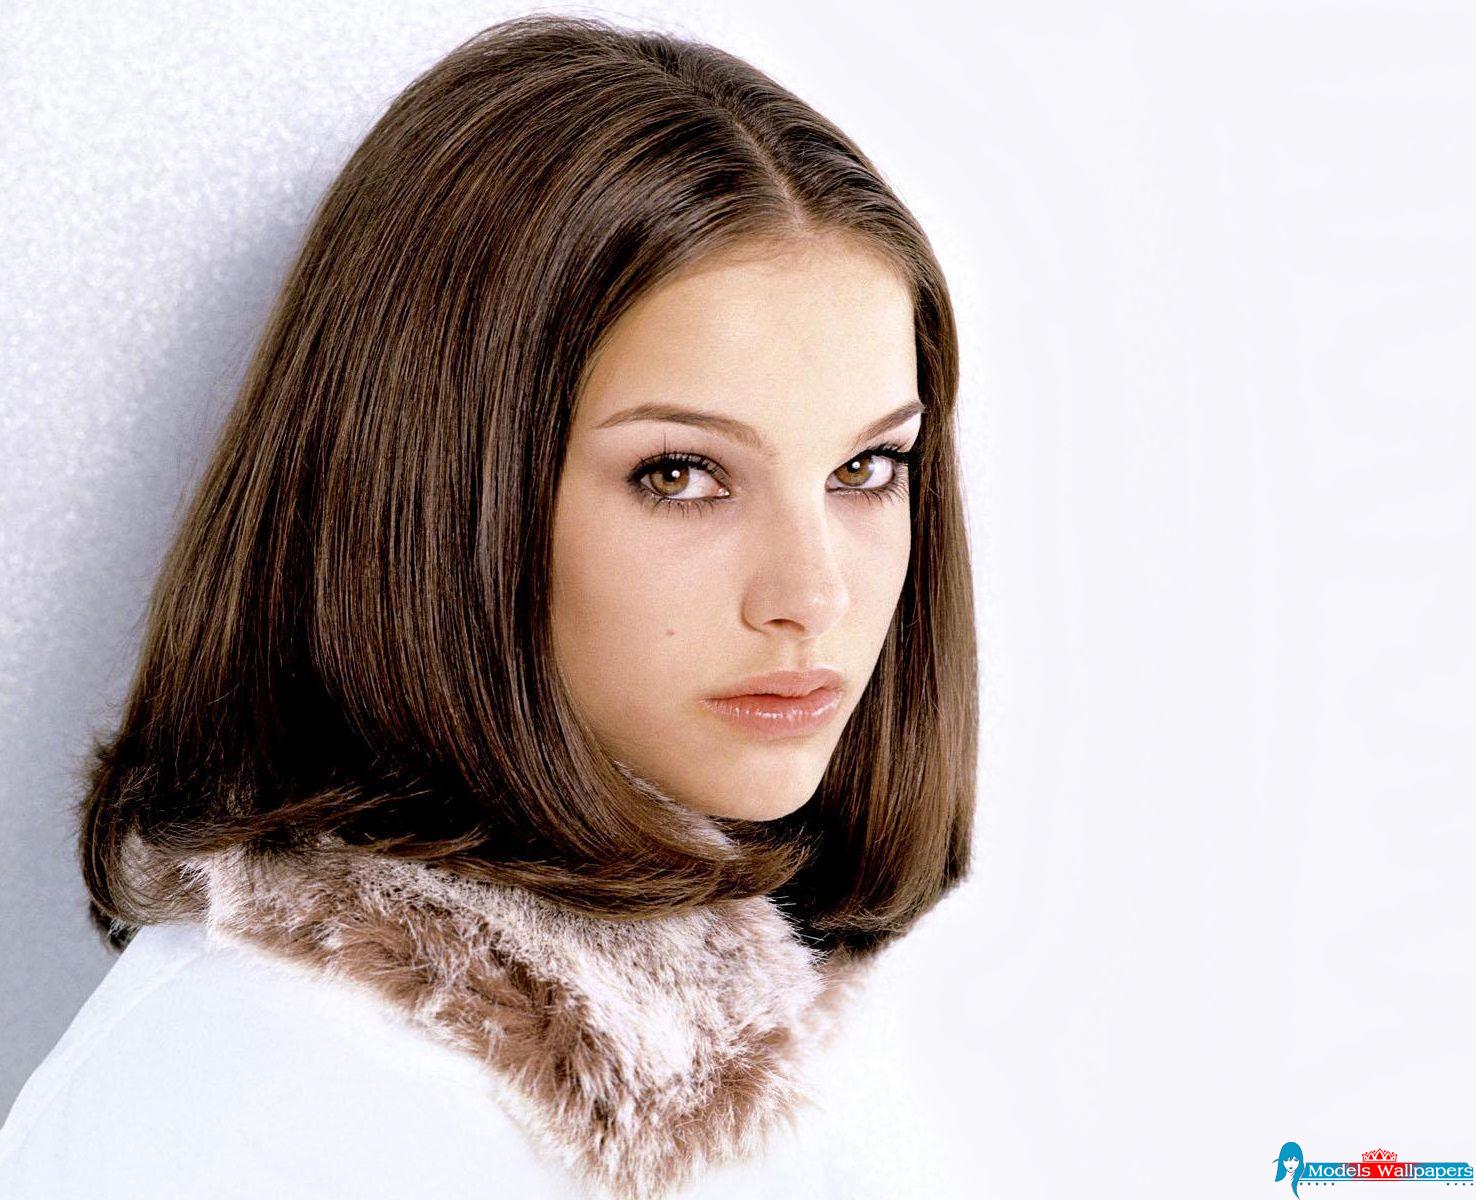 Natalie Portman Bob Images & Pictures - Findpik Rachel Mcadams